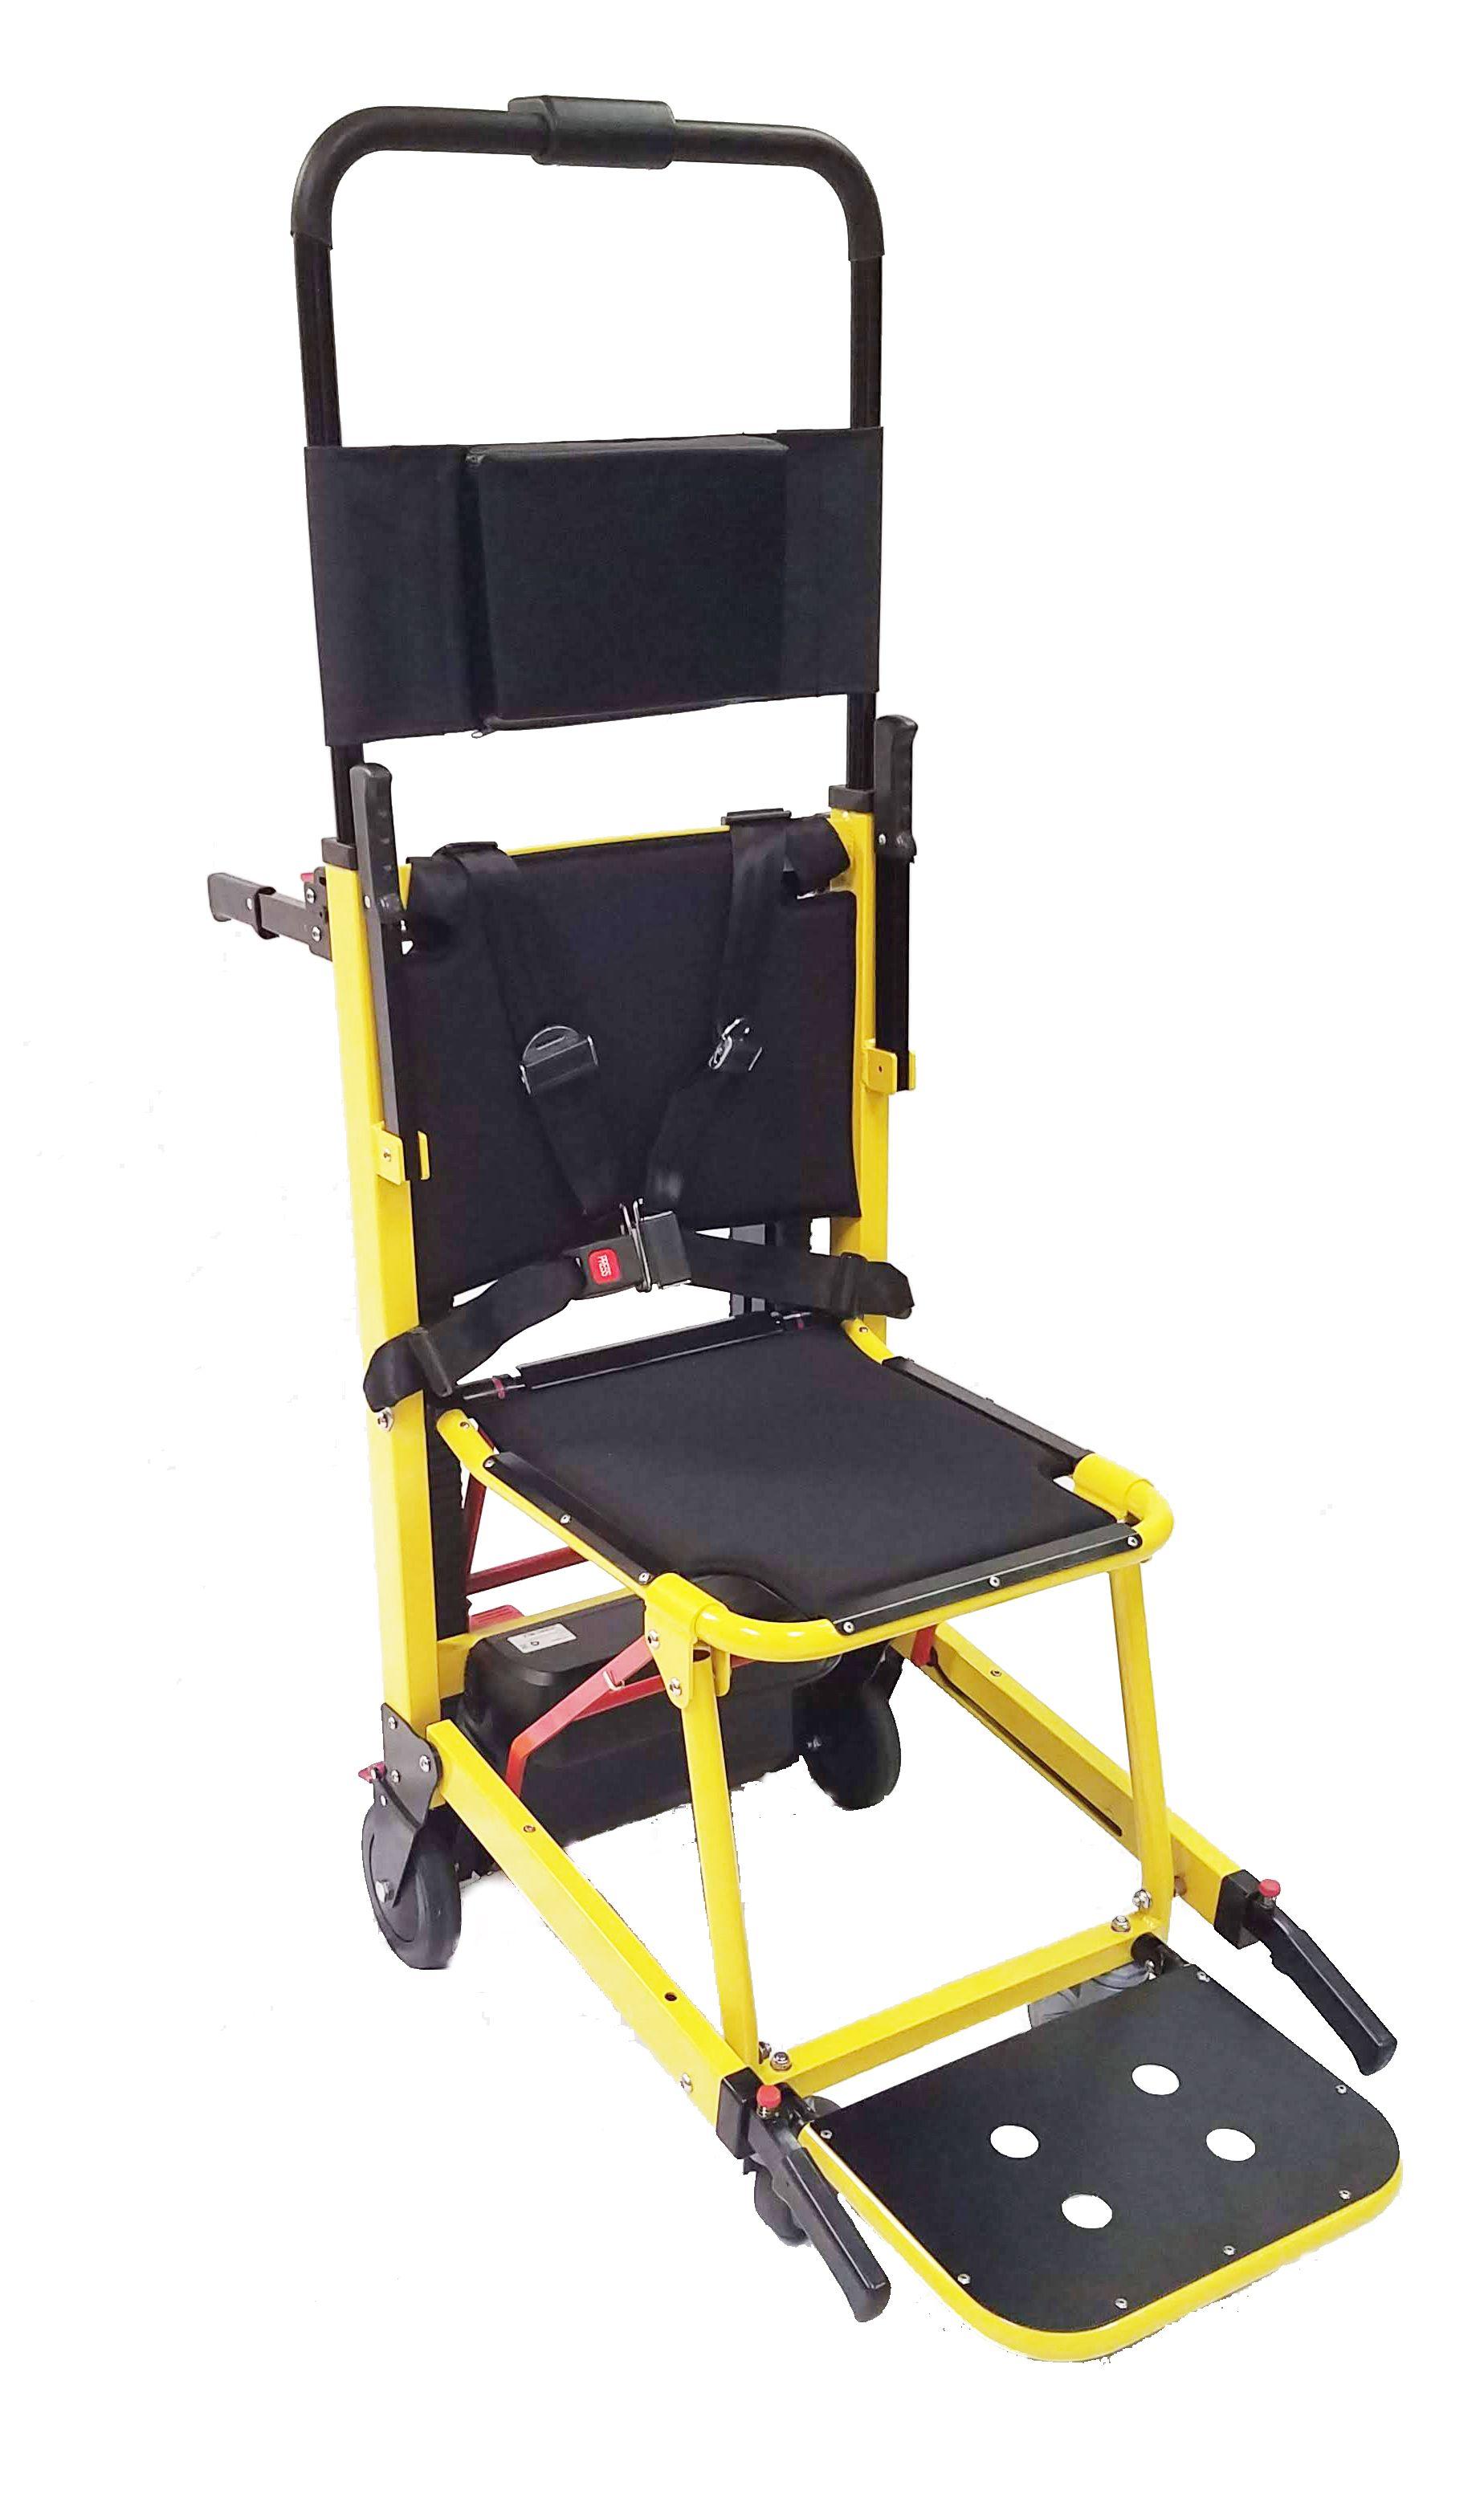 Battery Powered Stair Climb Assist Chair